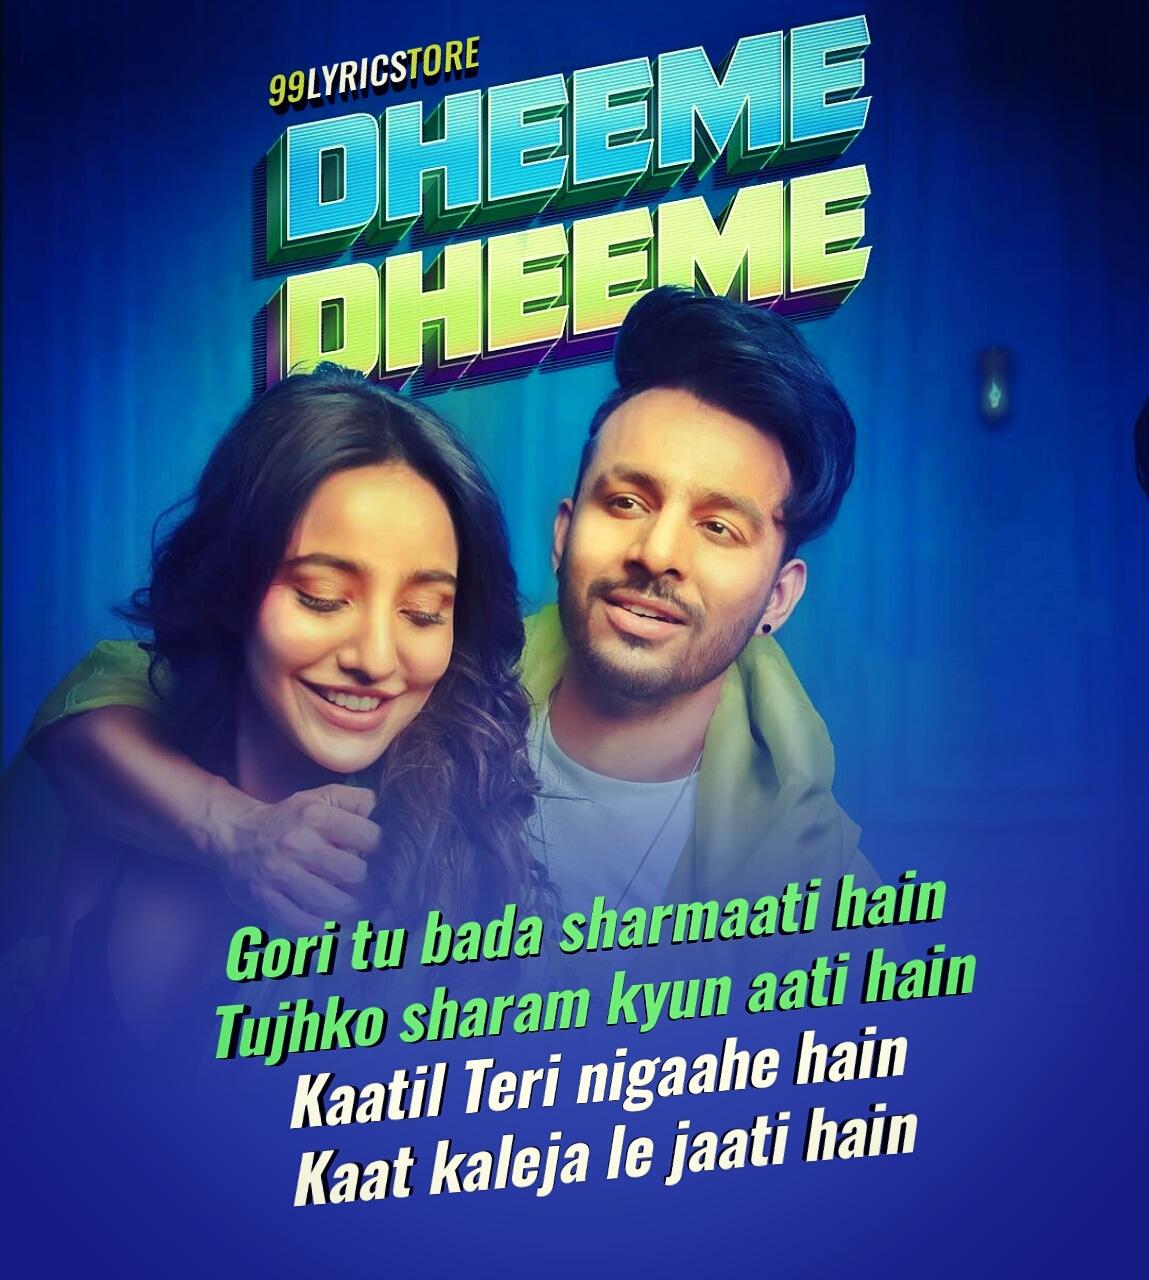 Dheeme Dheeme Lyrics Sung by Tony Kakkar Feat. Neha Sharma